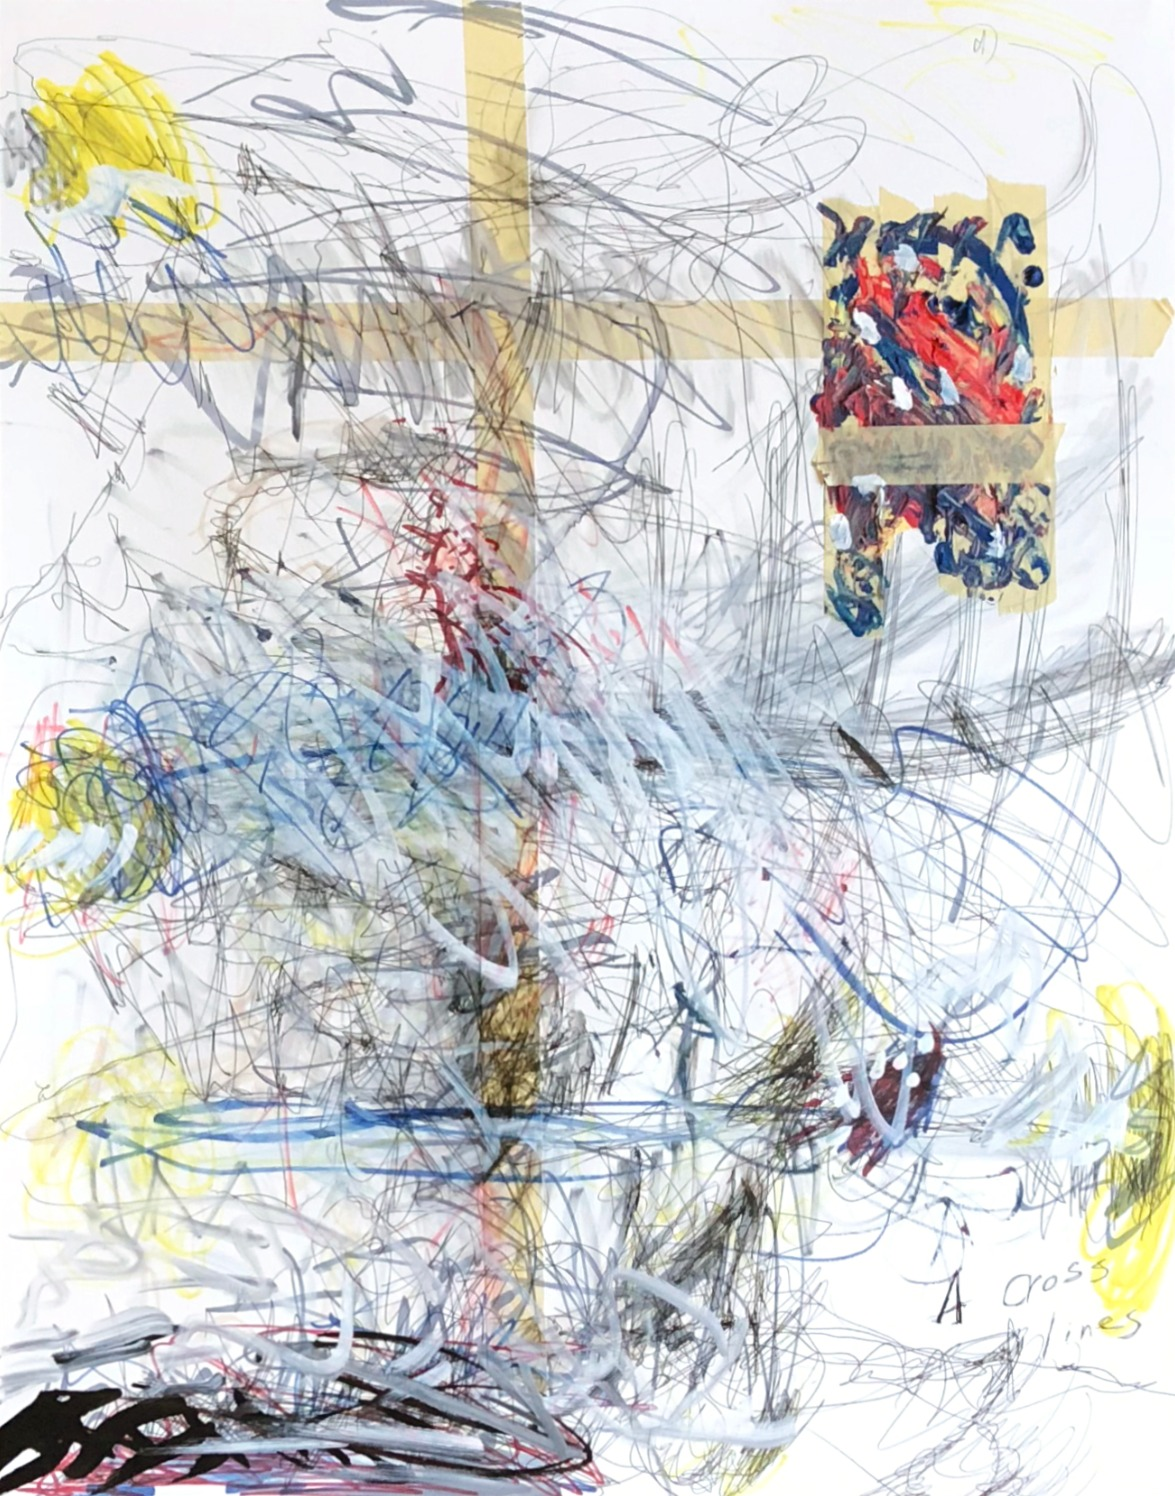 A Cross Lines (795 2/18)